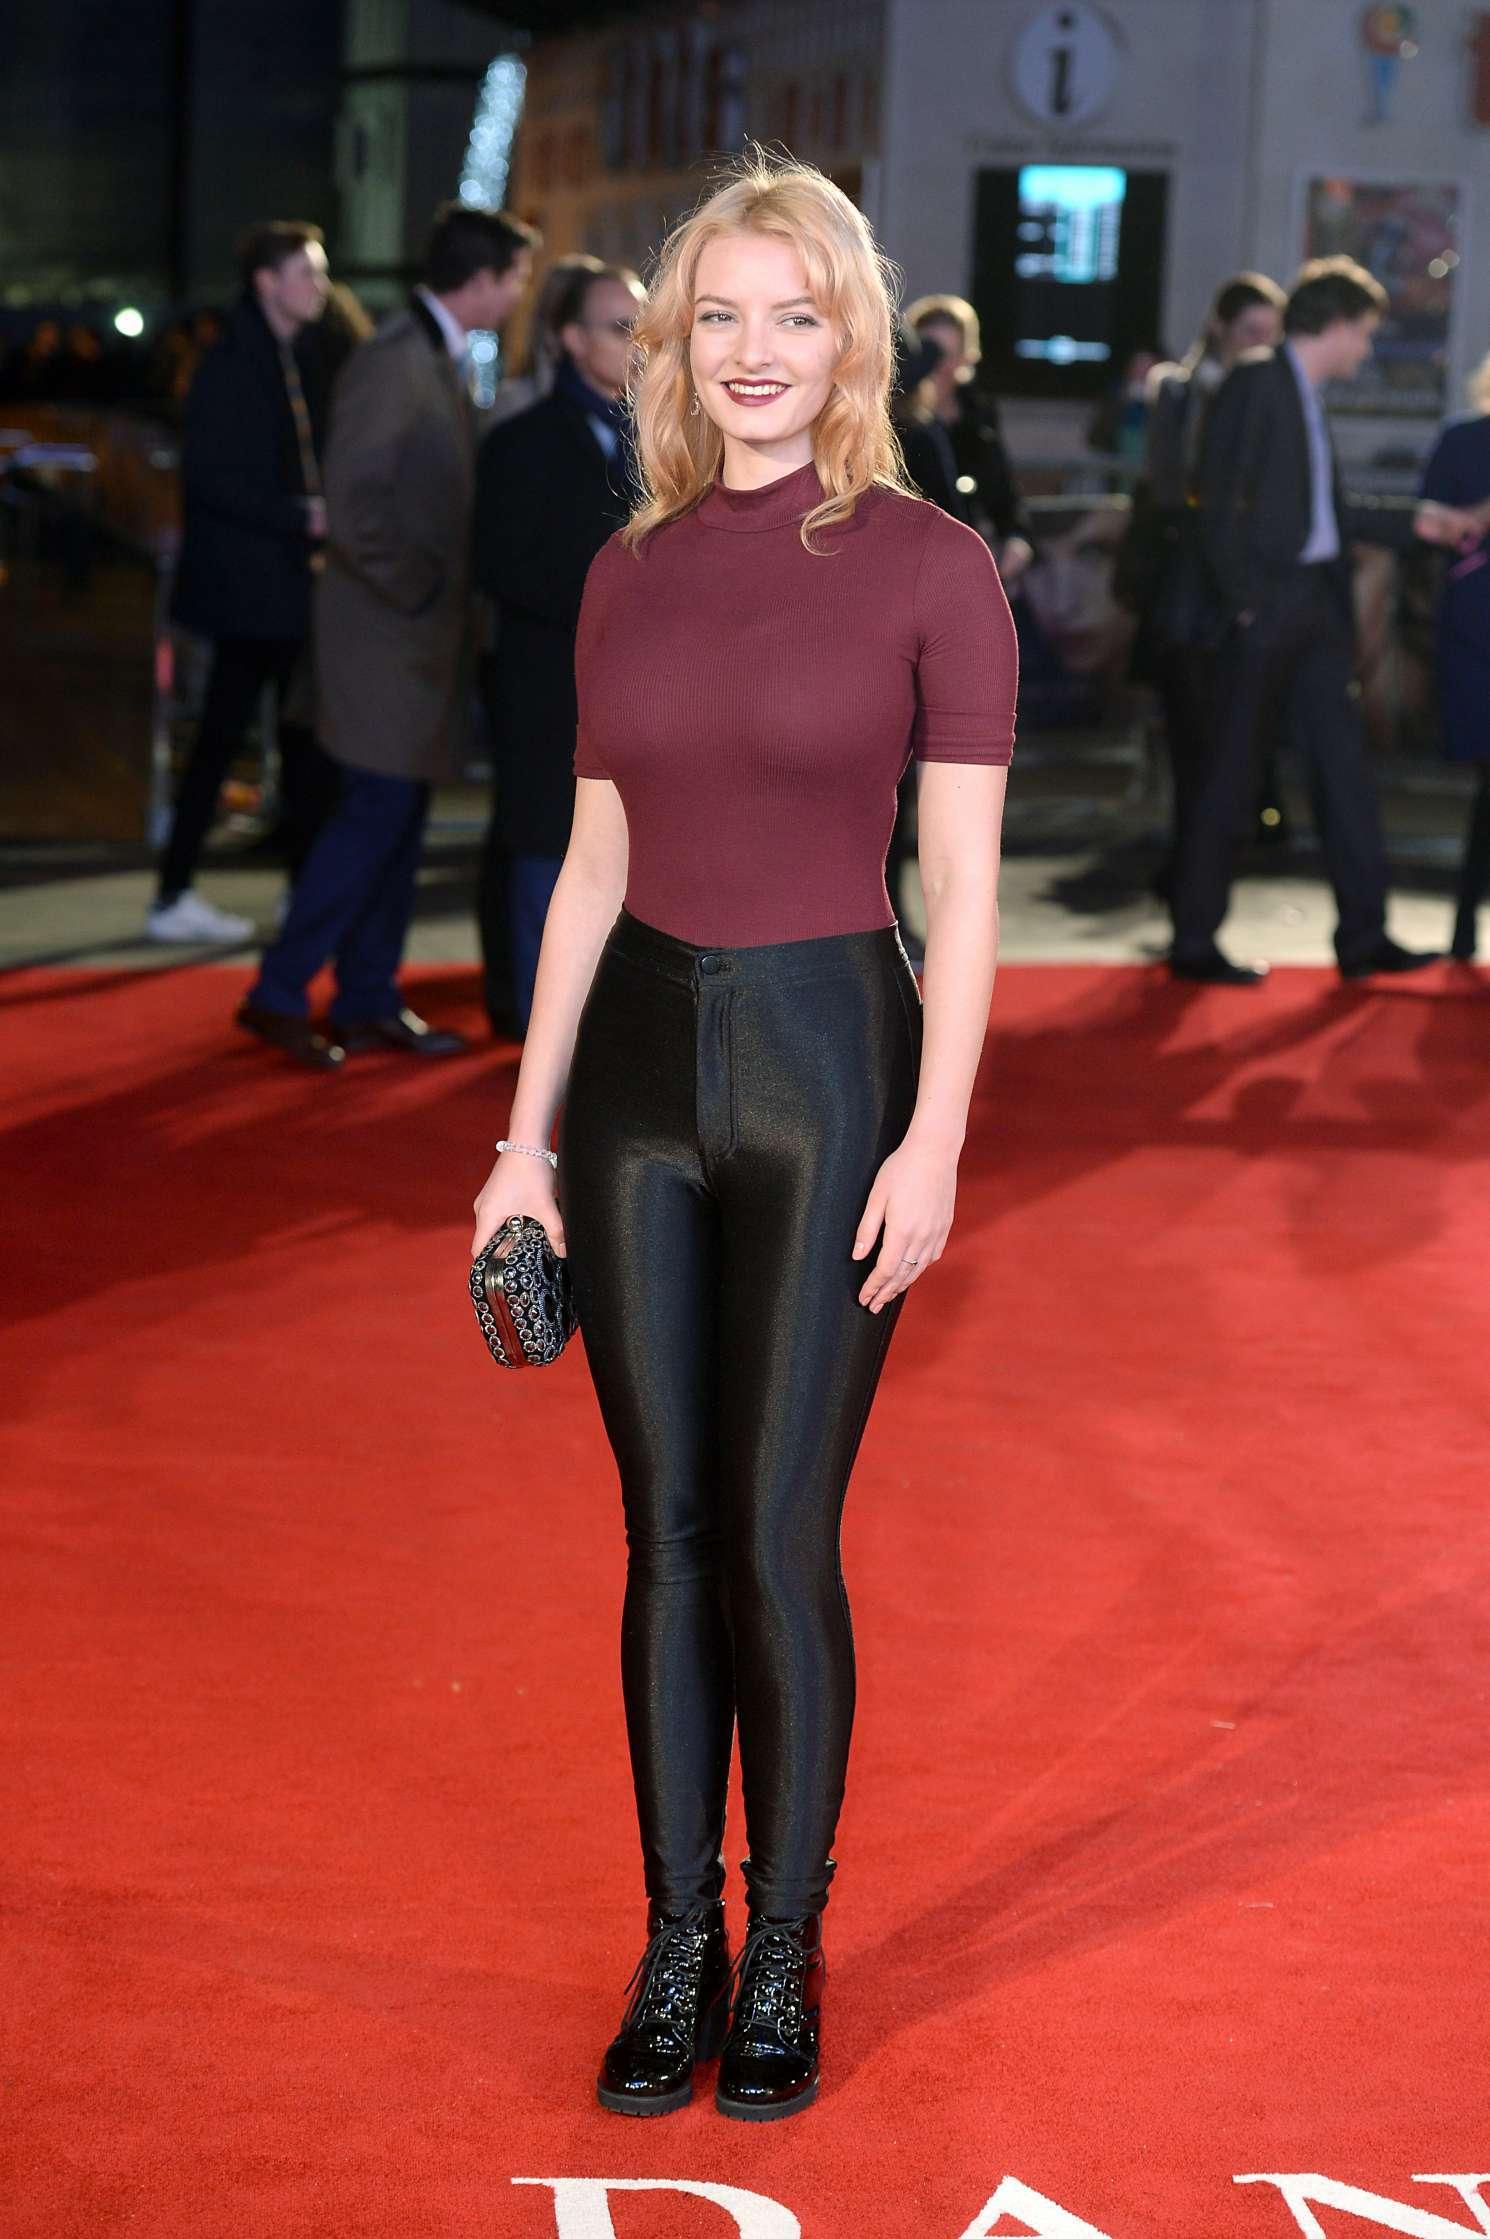 Dakota Blue Richards The Danish Girl premiere in London